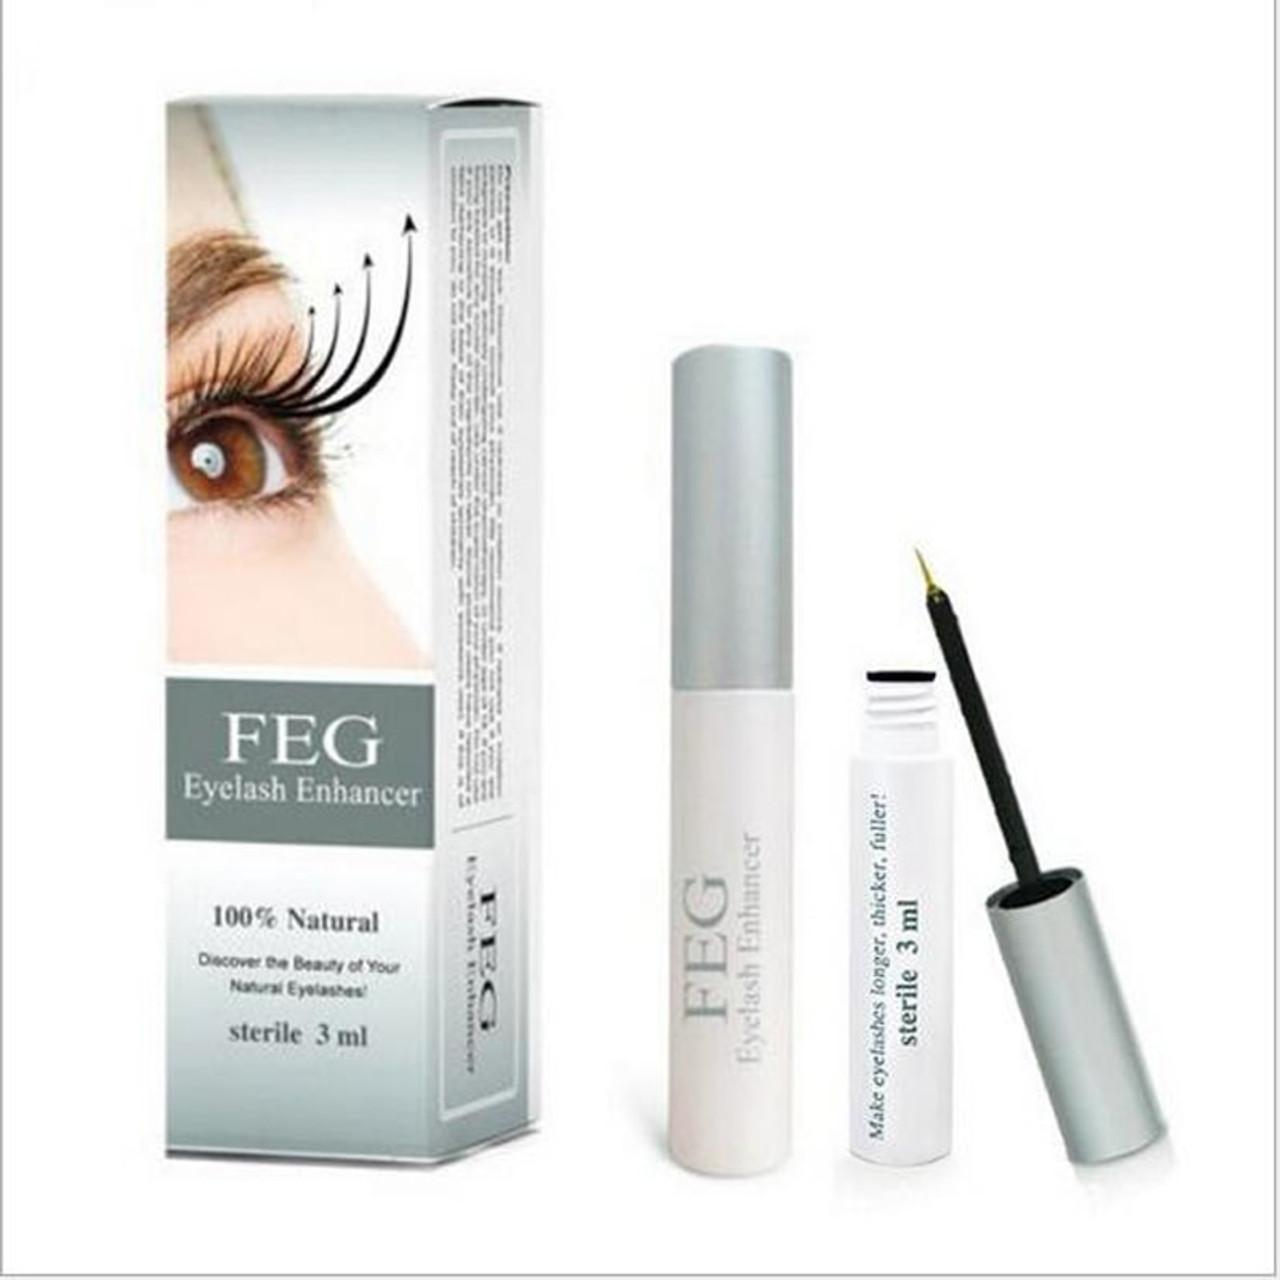 5647cb39ec4 50pcs Original Feg Eyelash Enhancer Makeup Eyelash Growth Serum Natural  Herbal Medicine Eye Lash Serum Growth ...